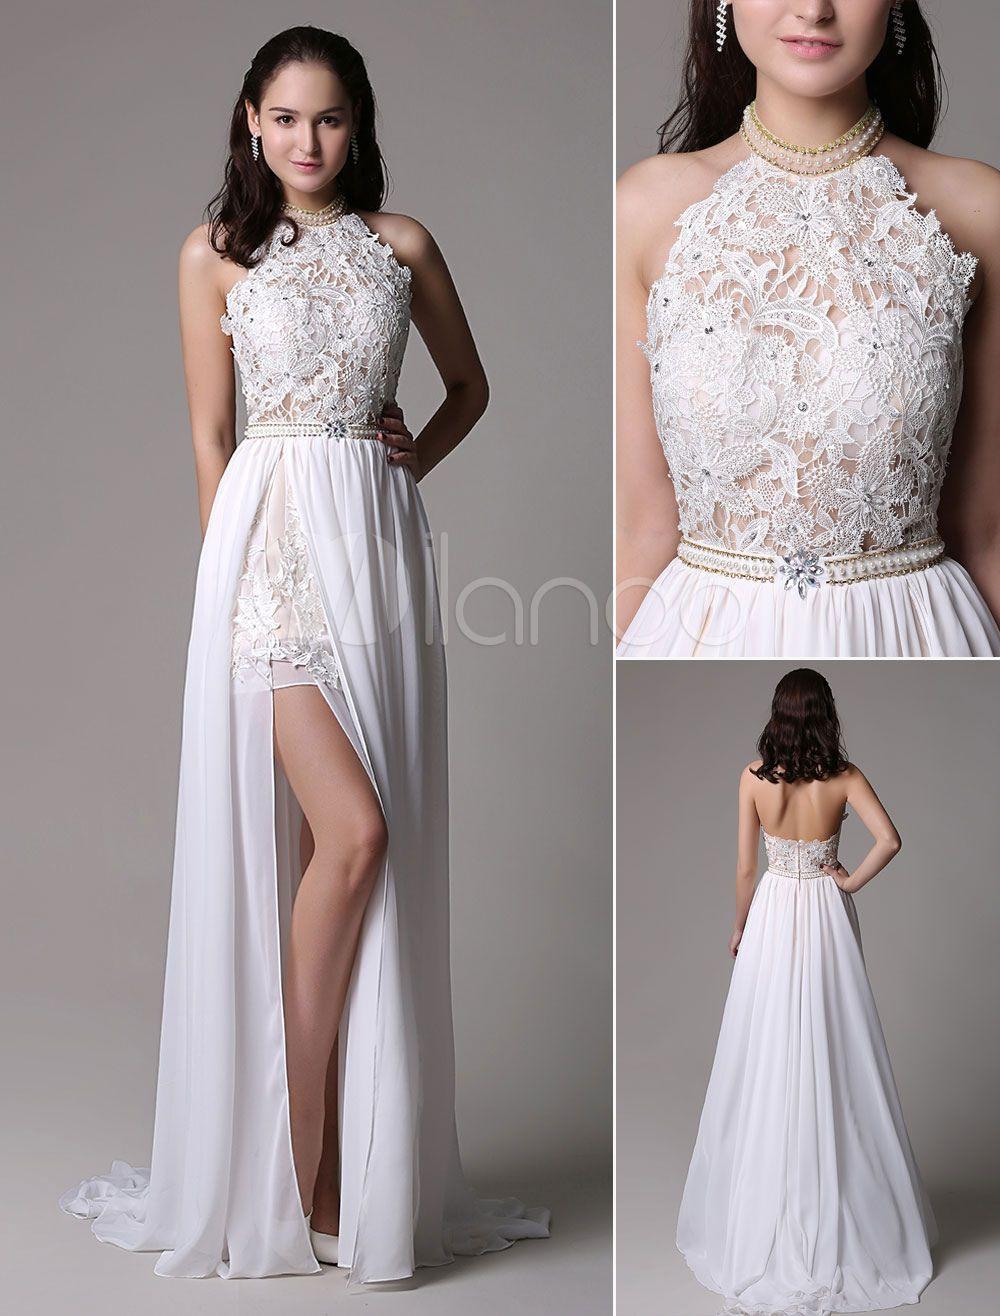 Formal Einzigartig Kleid Lang Weiß Ärmel17 Ausgezeichnet Kleid Lang Weiß Ärmel